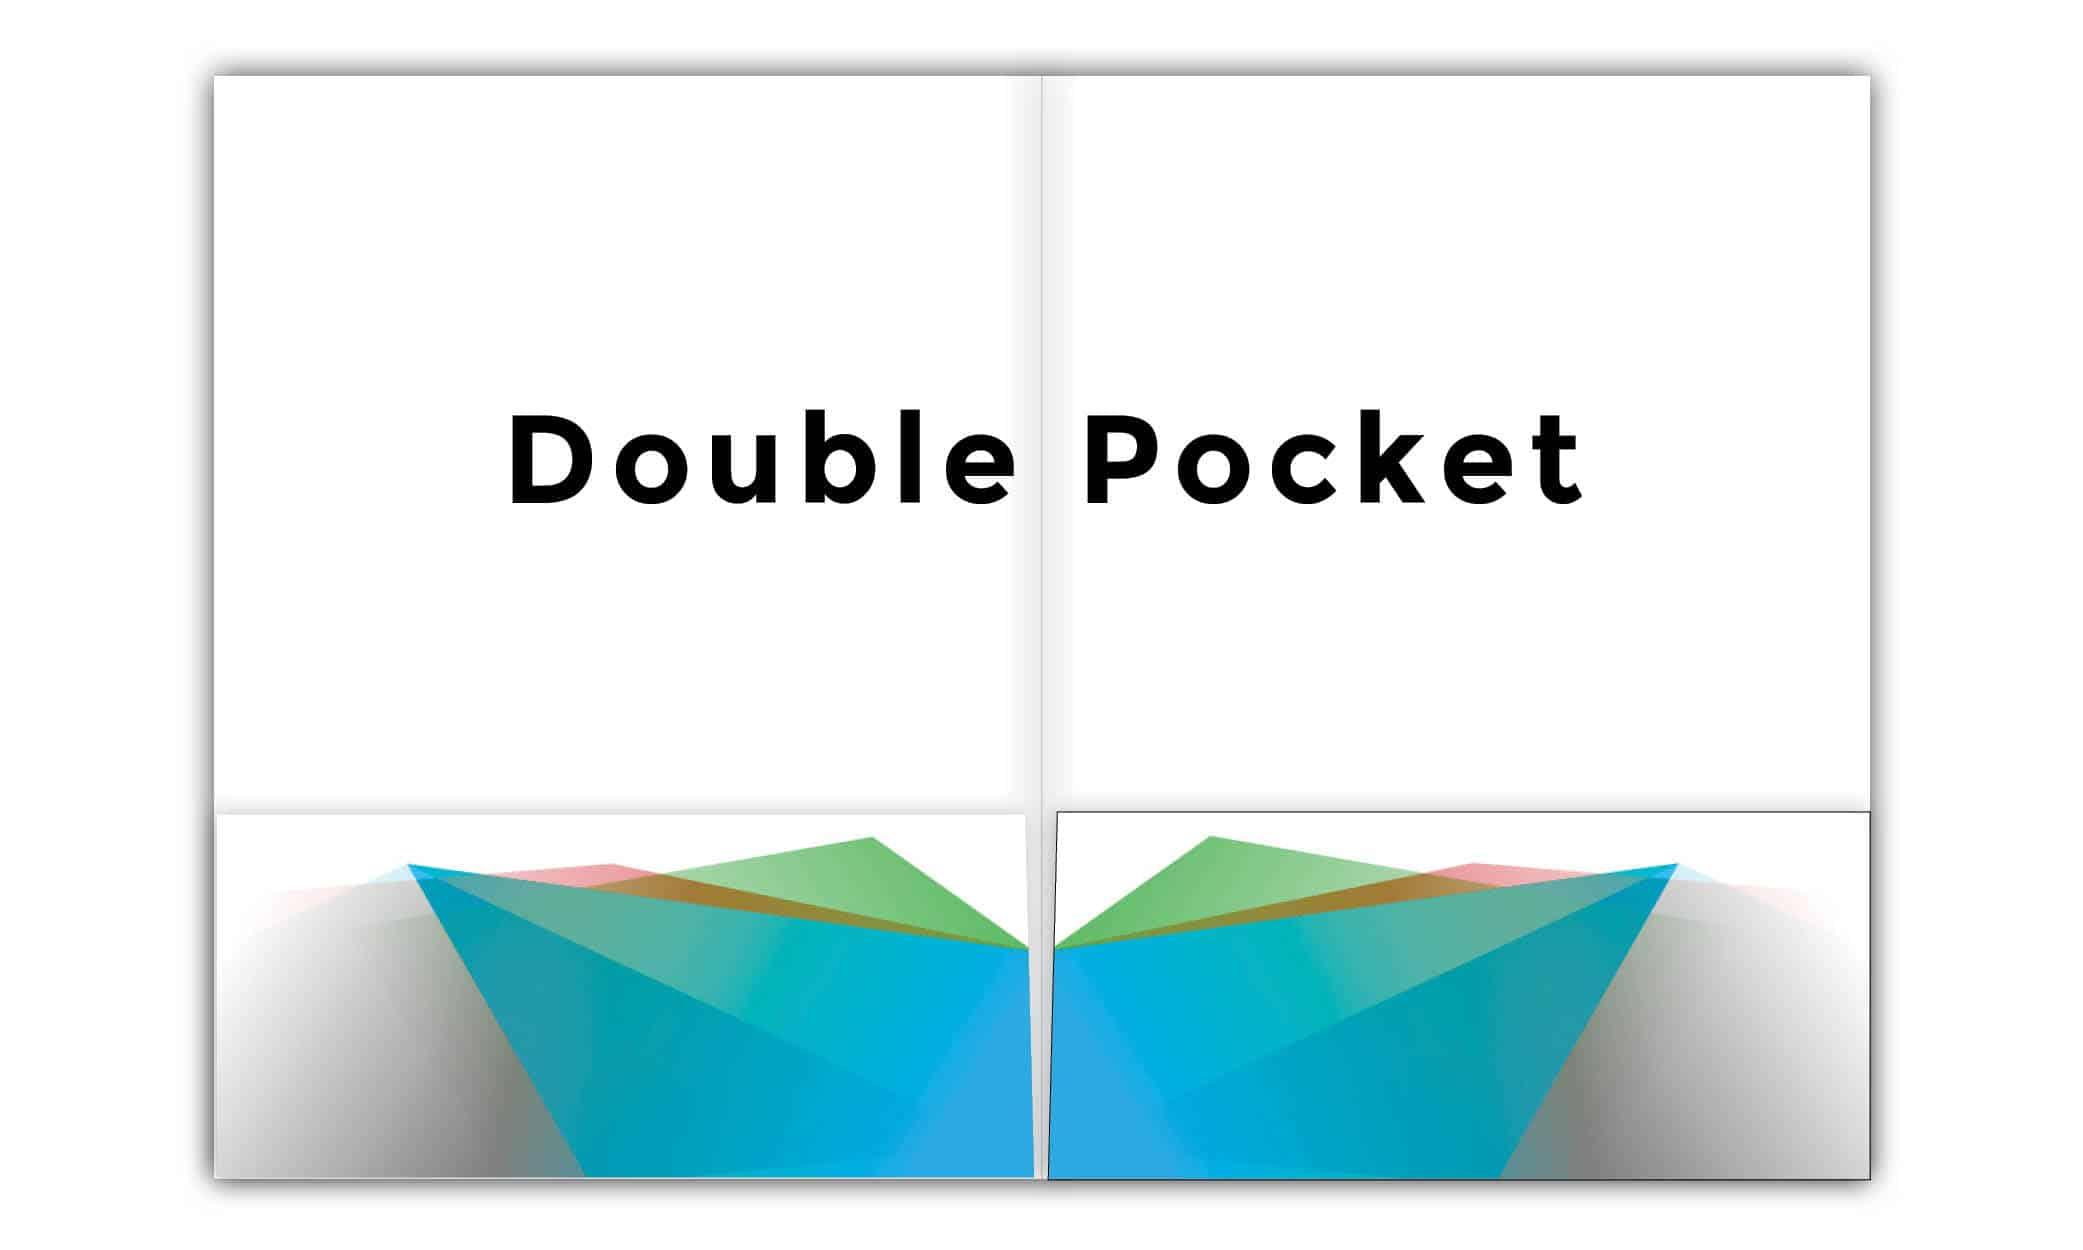 Double Pocket